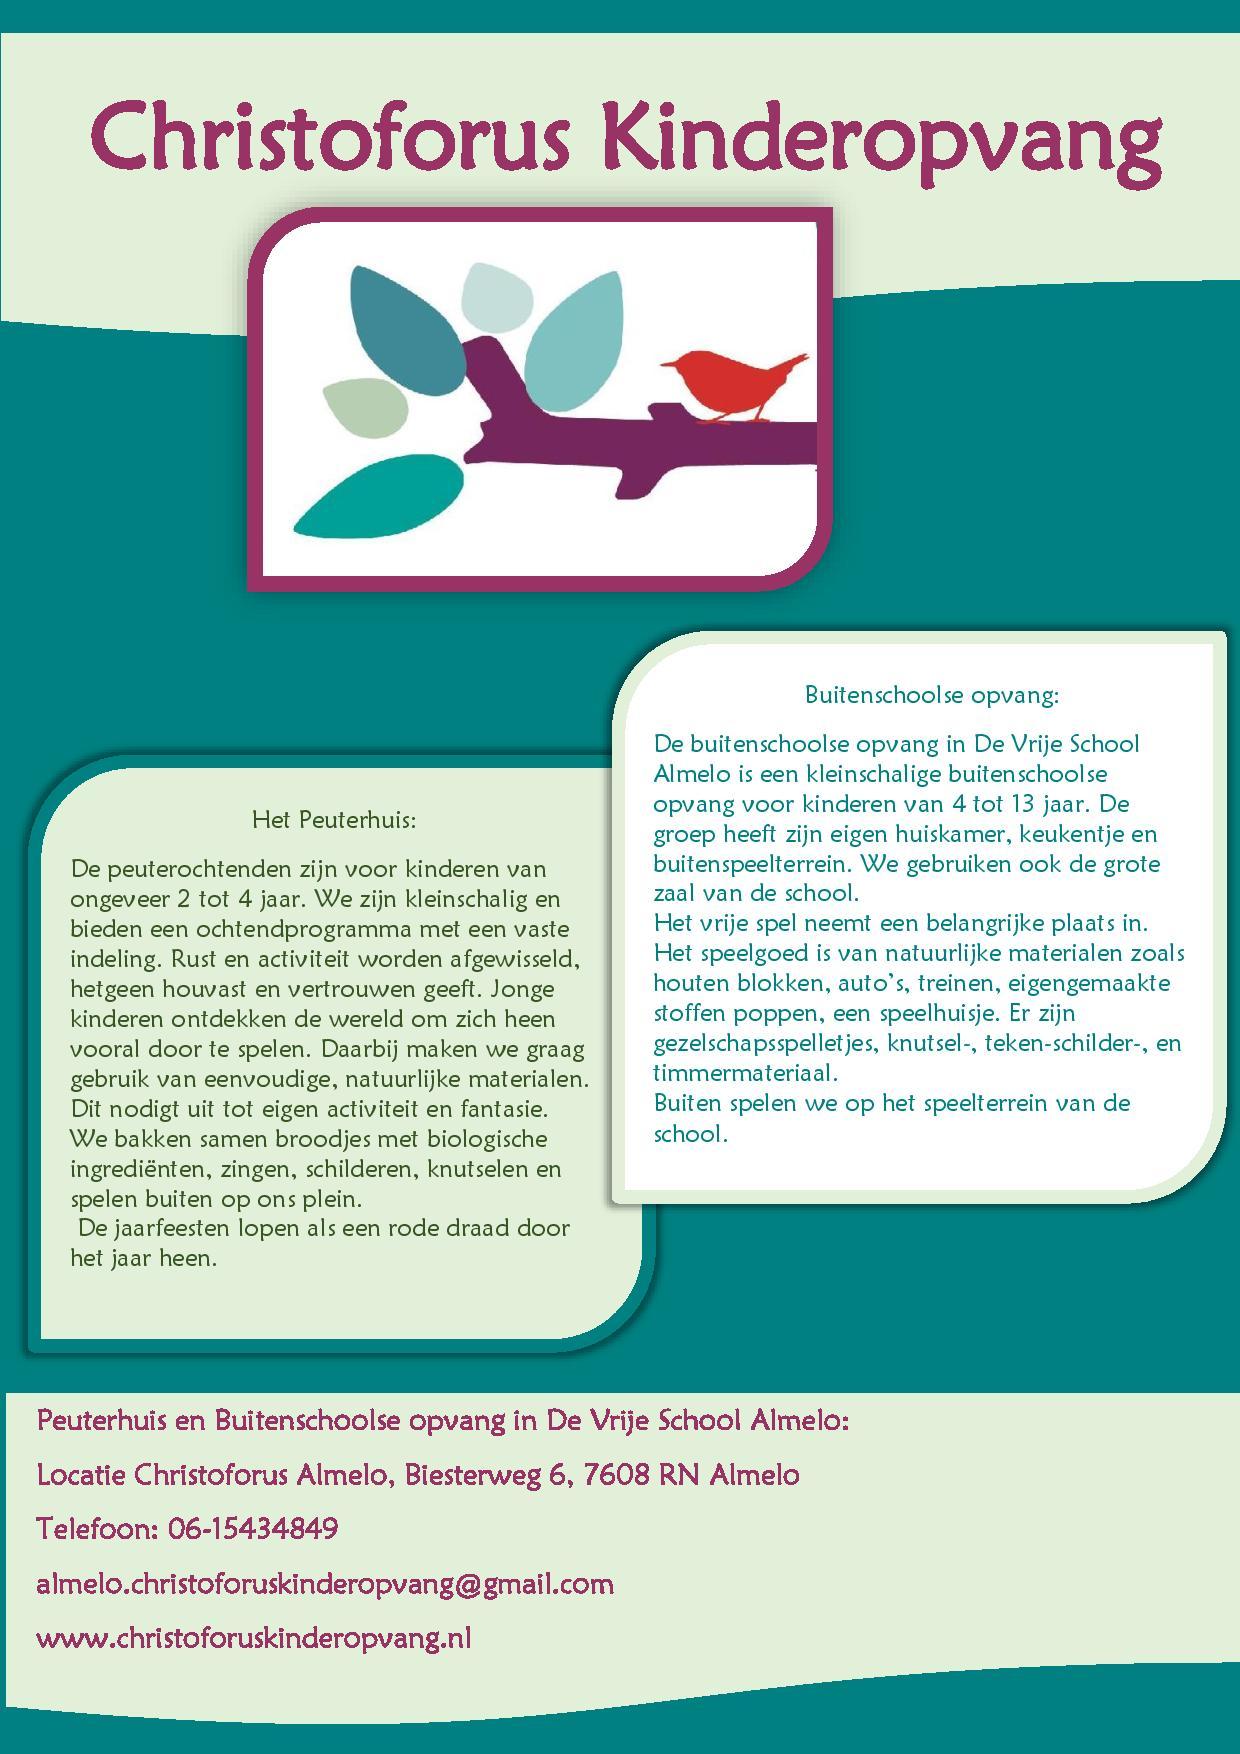 Affiche Christoforus Kinderopvang Page 001 (1)